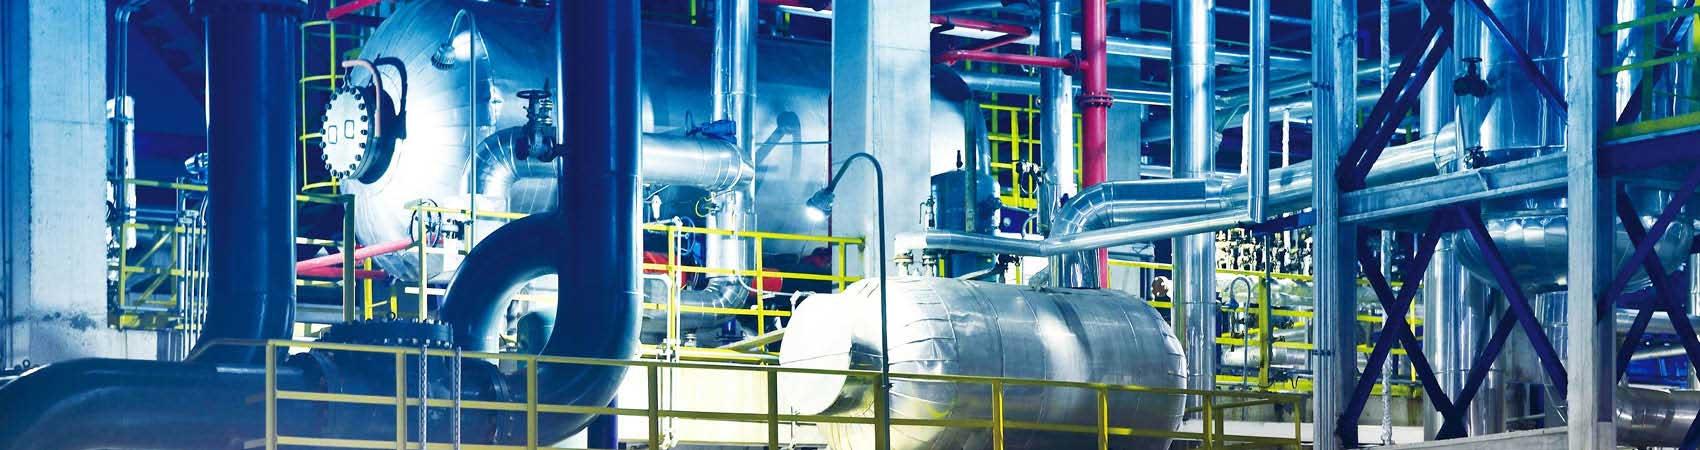 IndustrialProducts-HERO-3